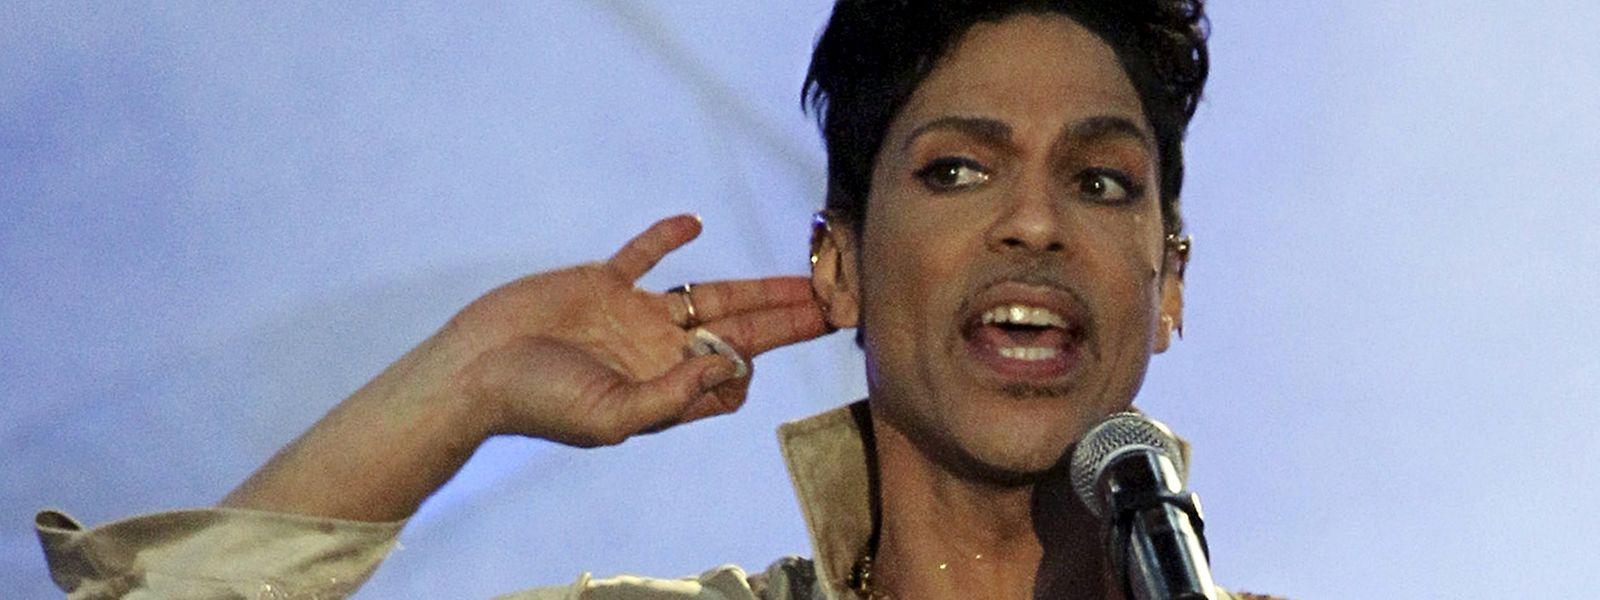 Vieles deutet darauf hin, dass Prince medikamentenabhängig war.